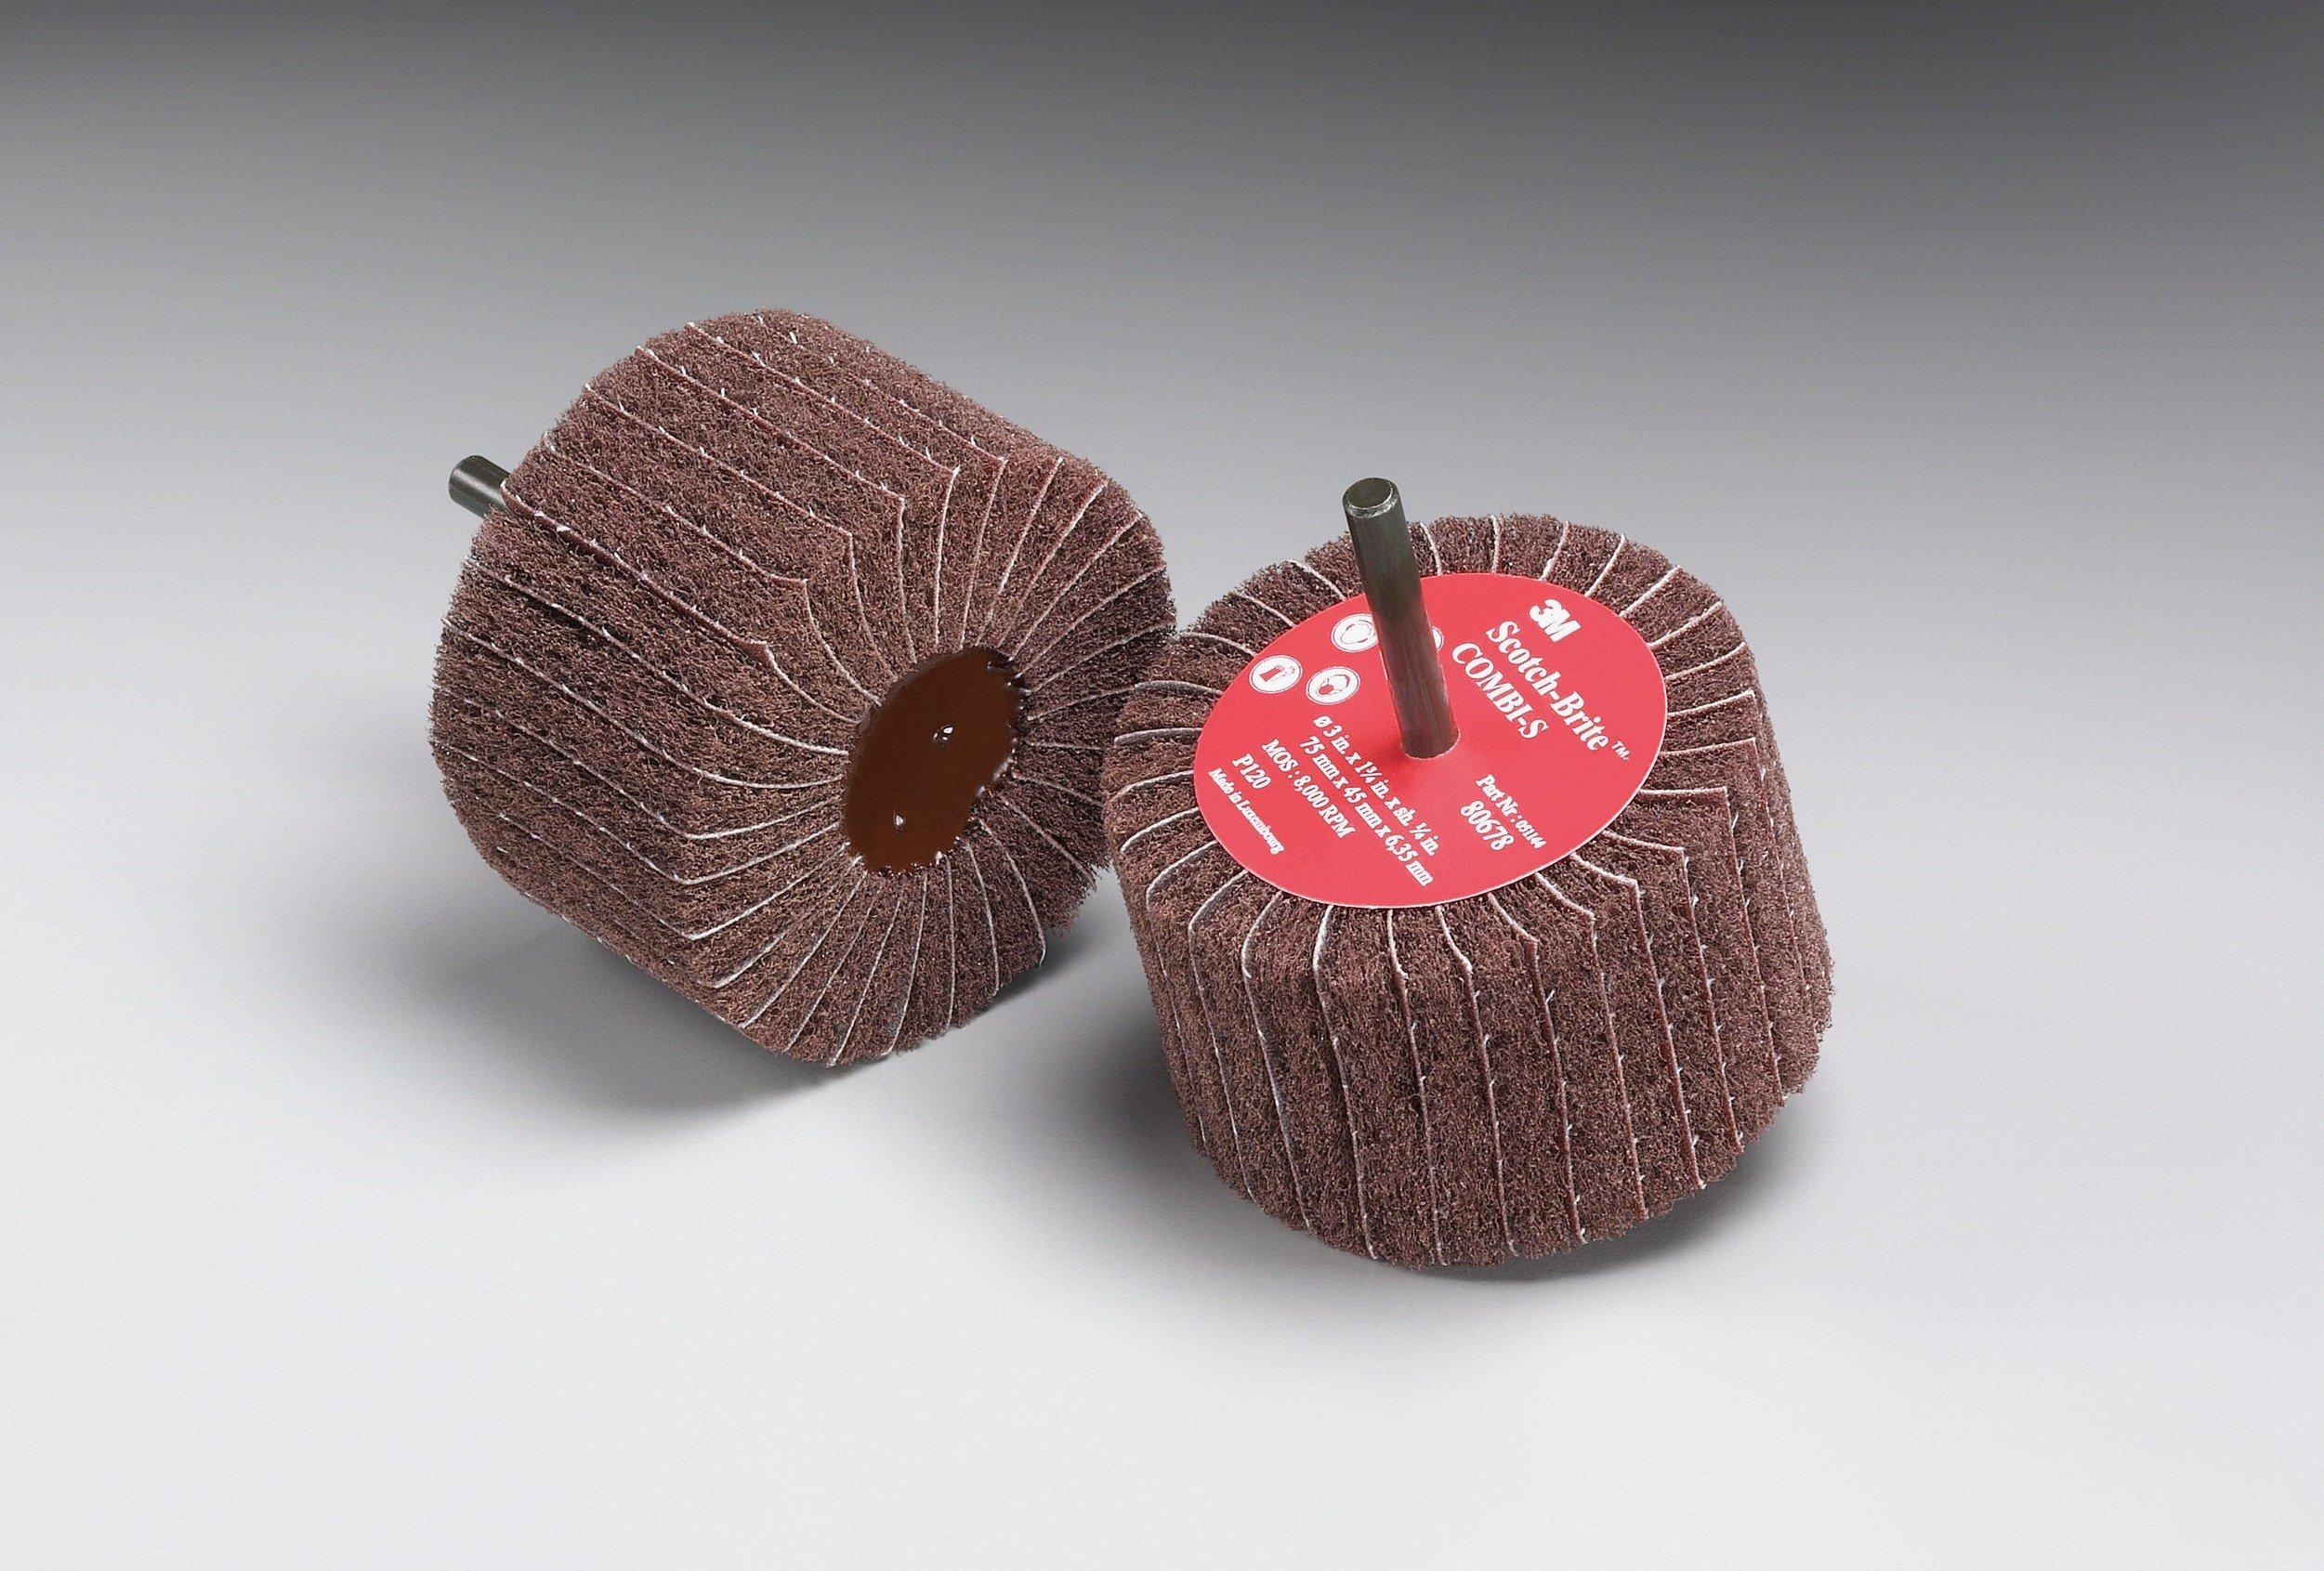 Scotch-Brite(TM) Combi-S Wheel 80799, X-Weight, Aluminum Oxide, 3'' Diameter x 1-3/4'' Width, 1/4'' Shank, P180 Grit, 8000 rpm, Maroon  (Pack of 10) by 3M